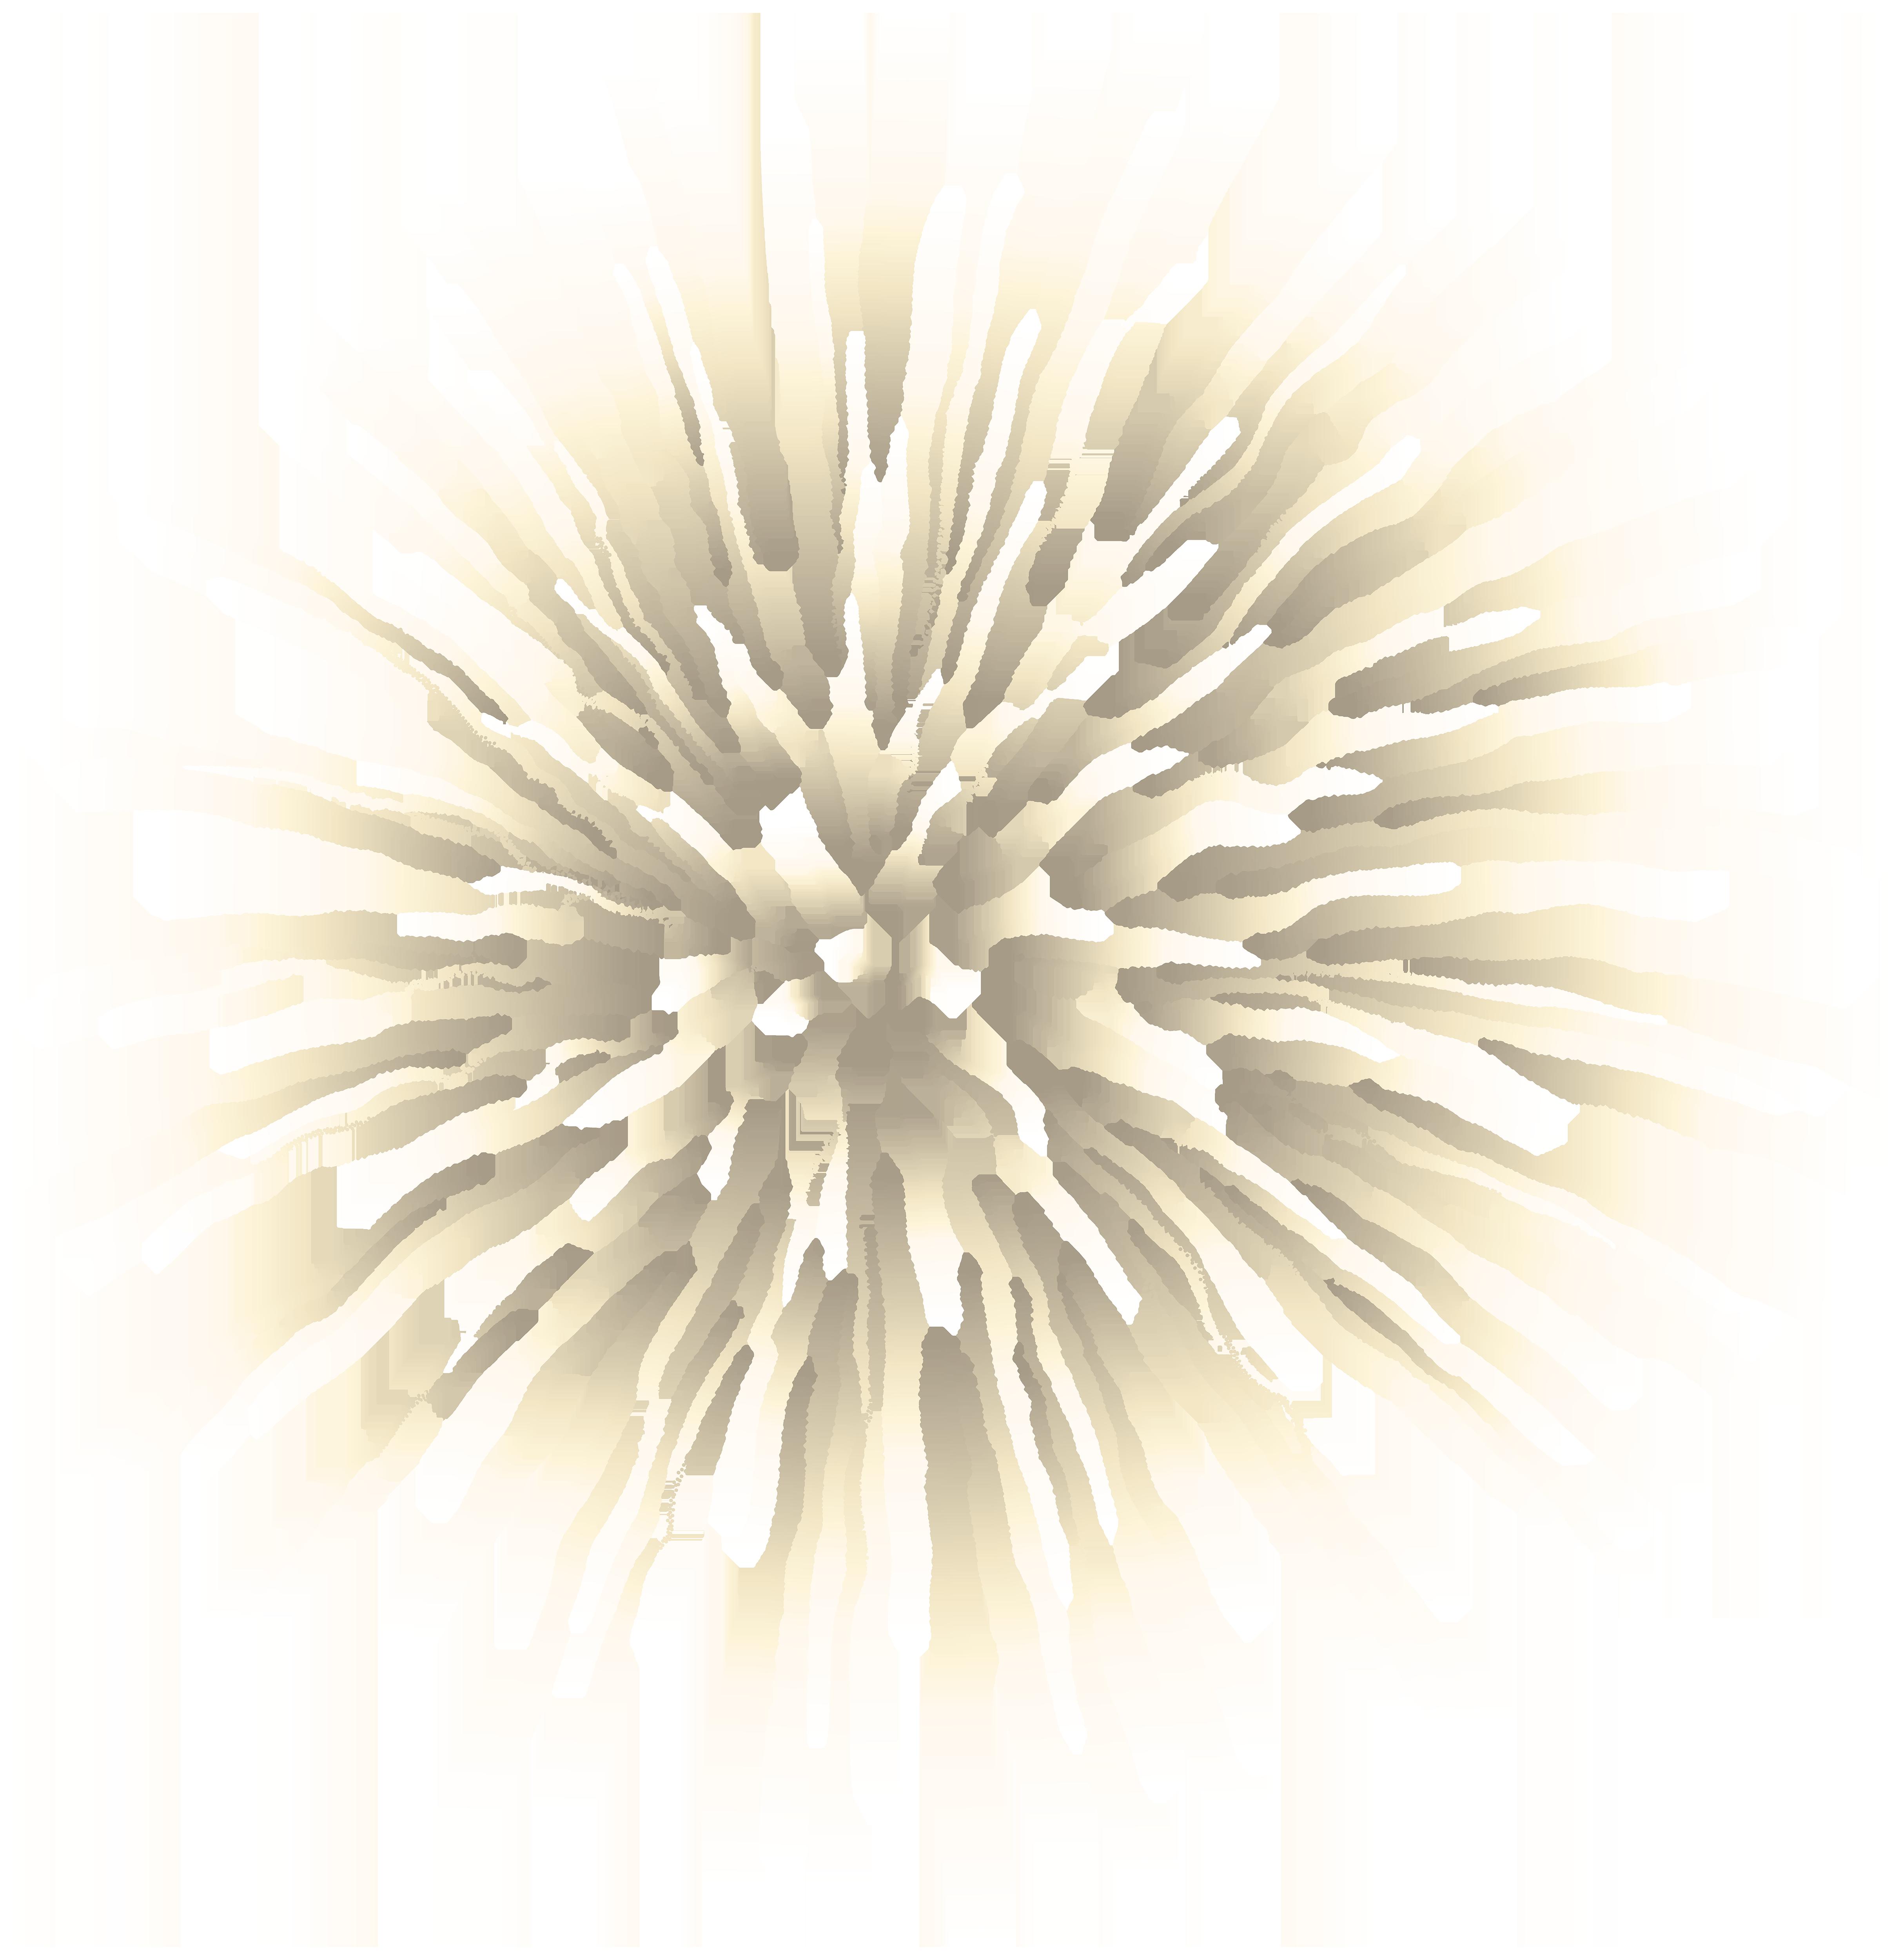 Firework white transparent clip. Clipart fireworks black background